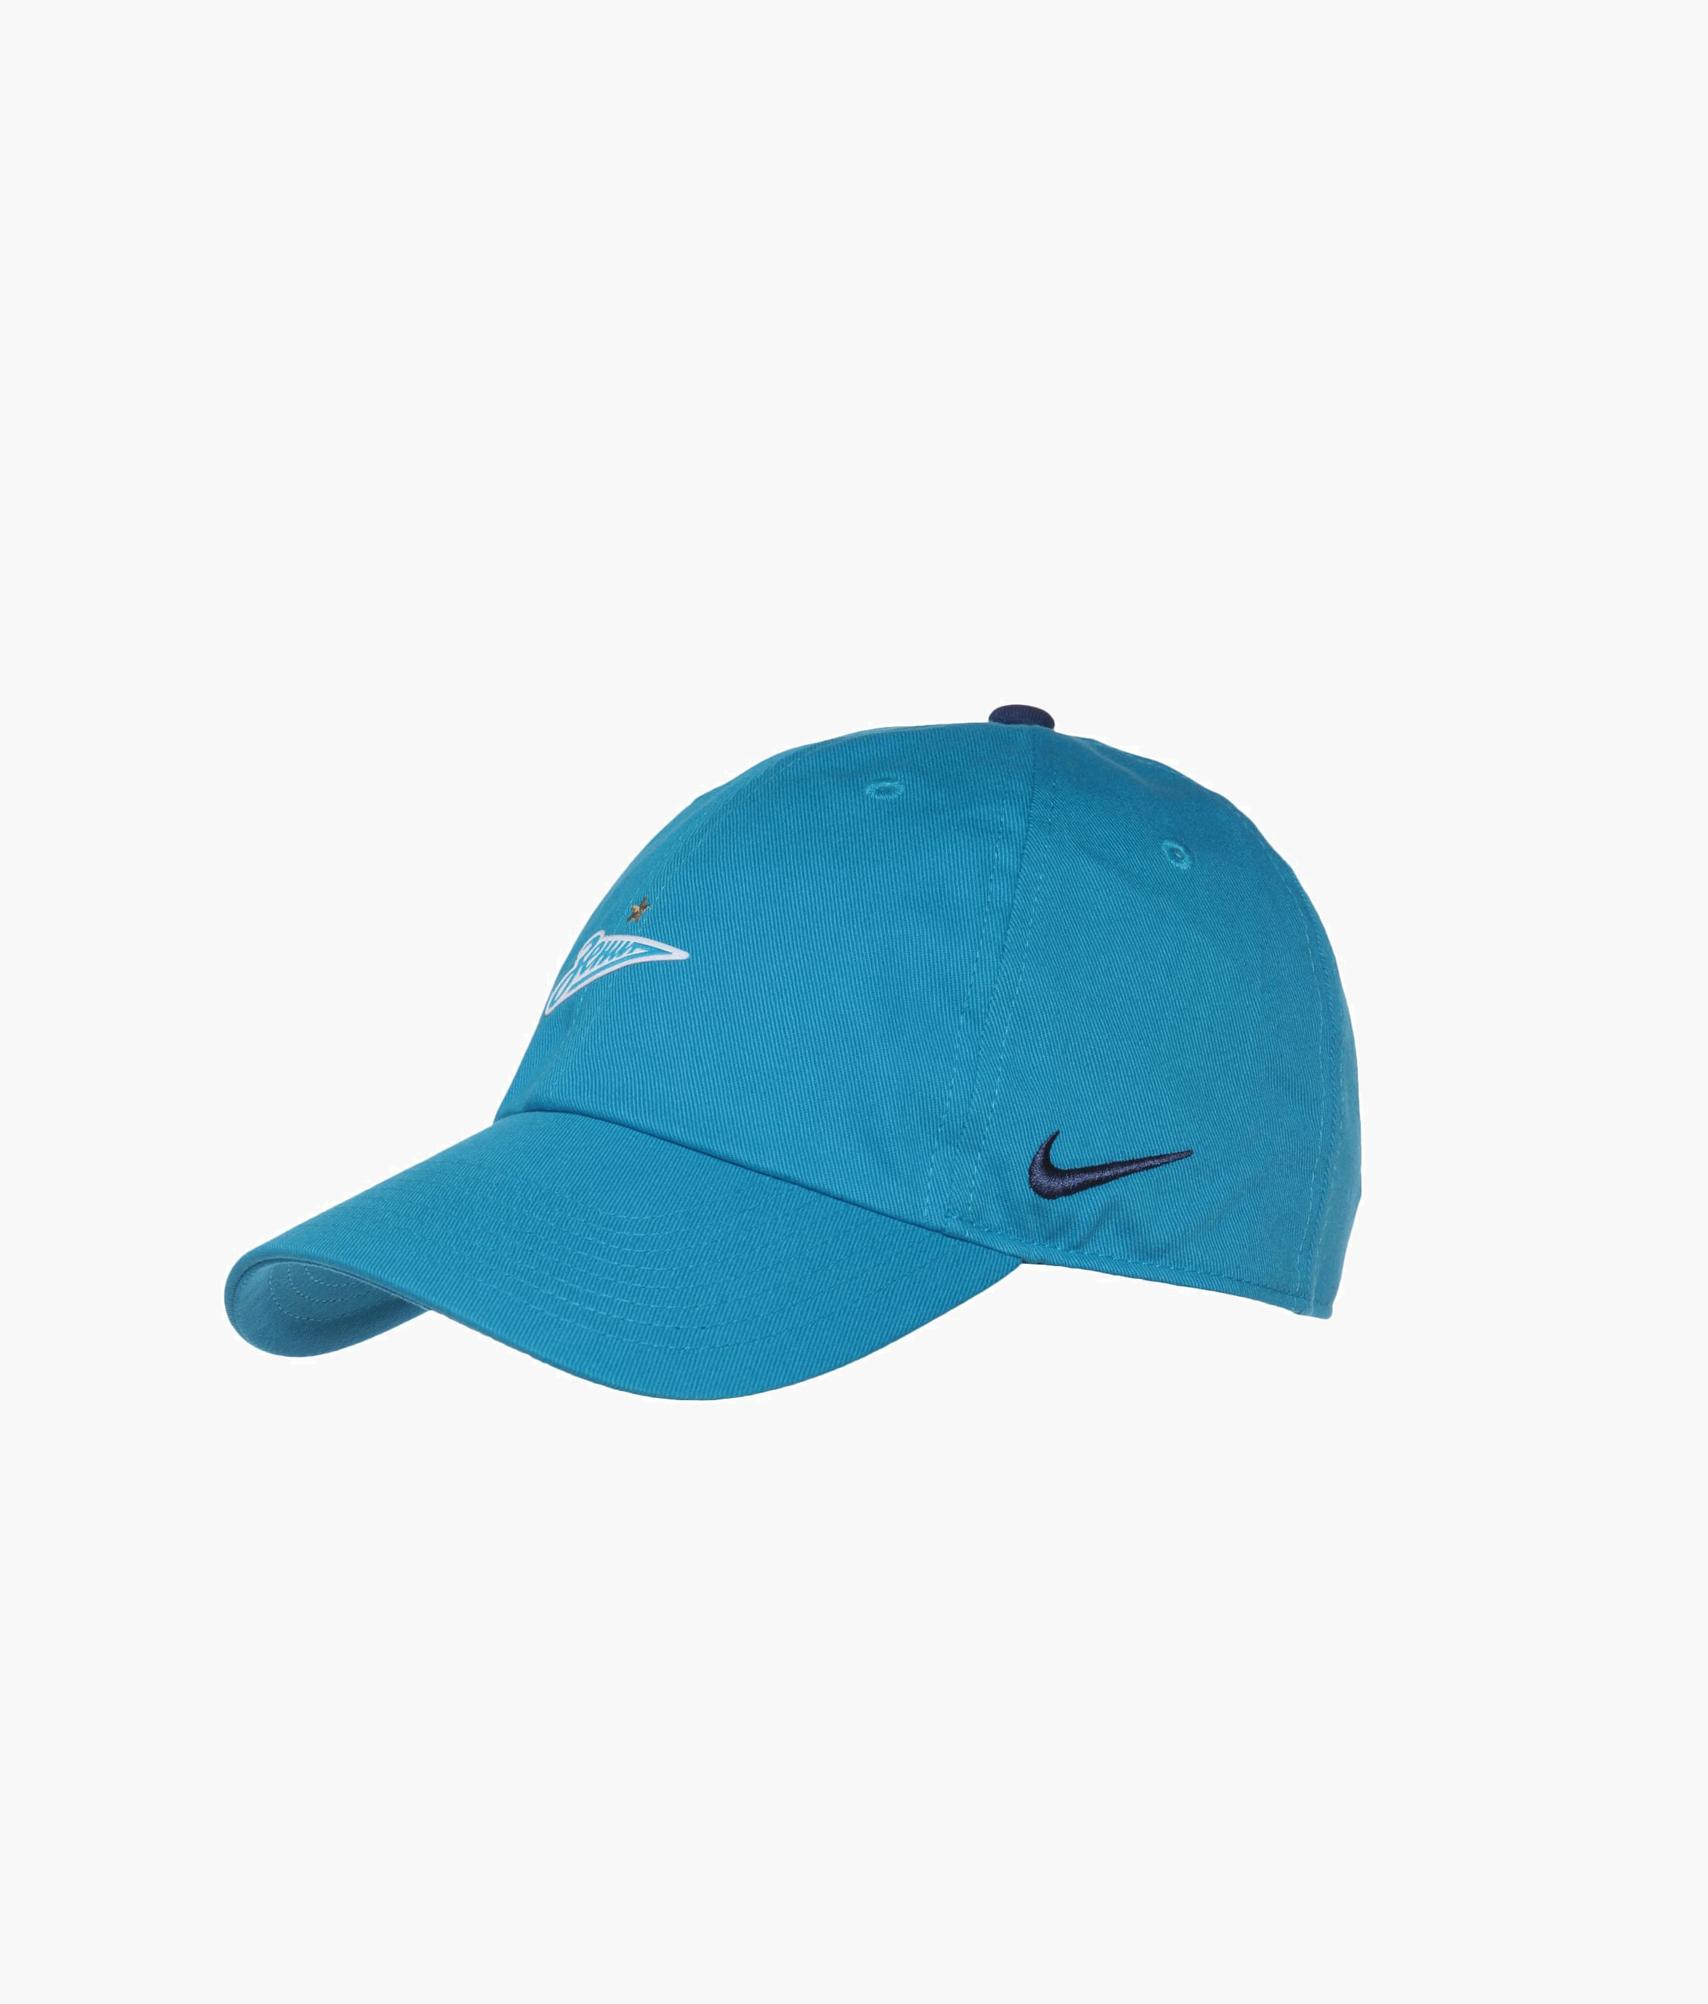 Бейсболка Nike Nike Цвет-Лазурный бейсболка nike run aw84 651659 413